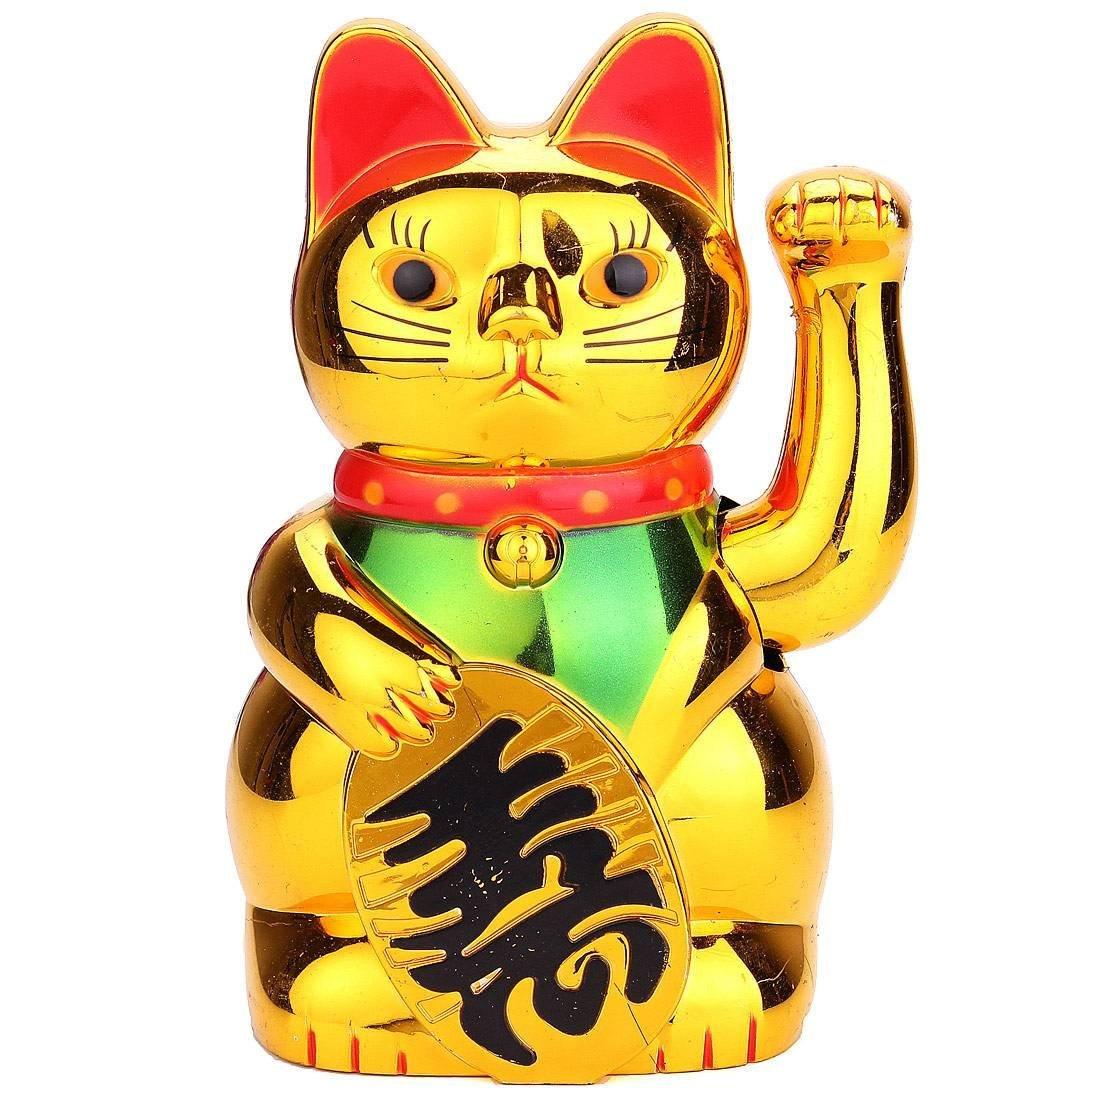 Chinese Gold Maneki Neko Cute Lucky Welcome Cat Electric Craft Art Shop Hotel Home Decoration Accessories Miniature Figurines